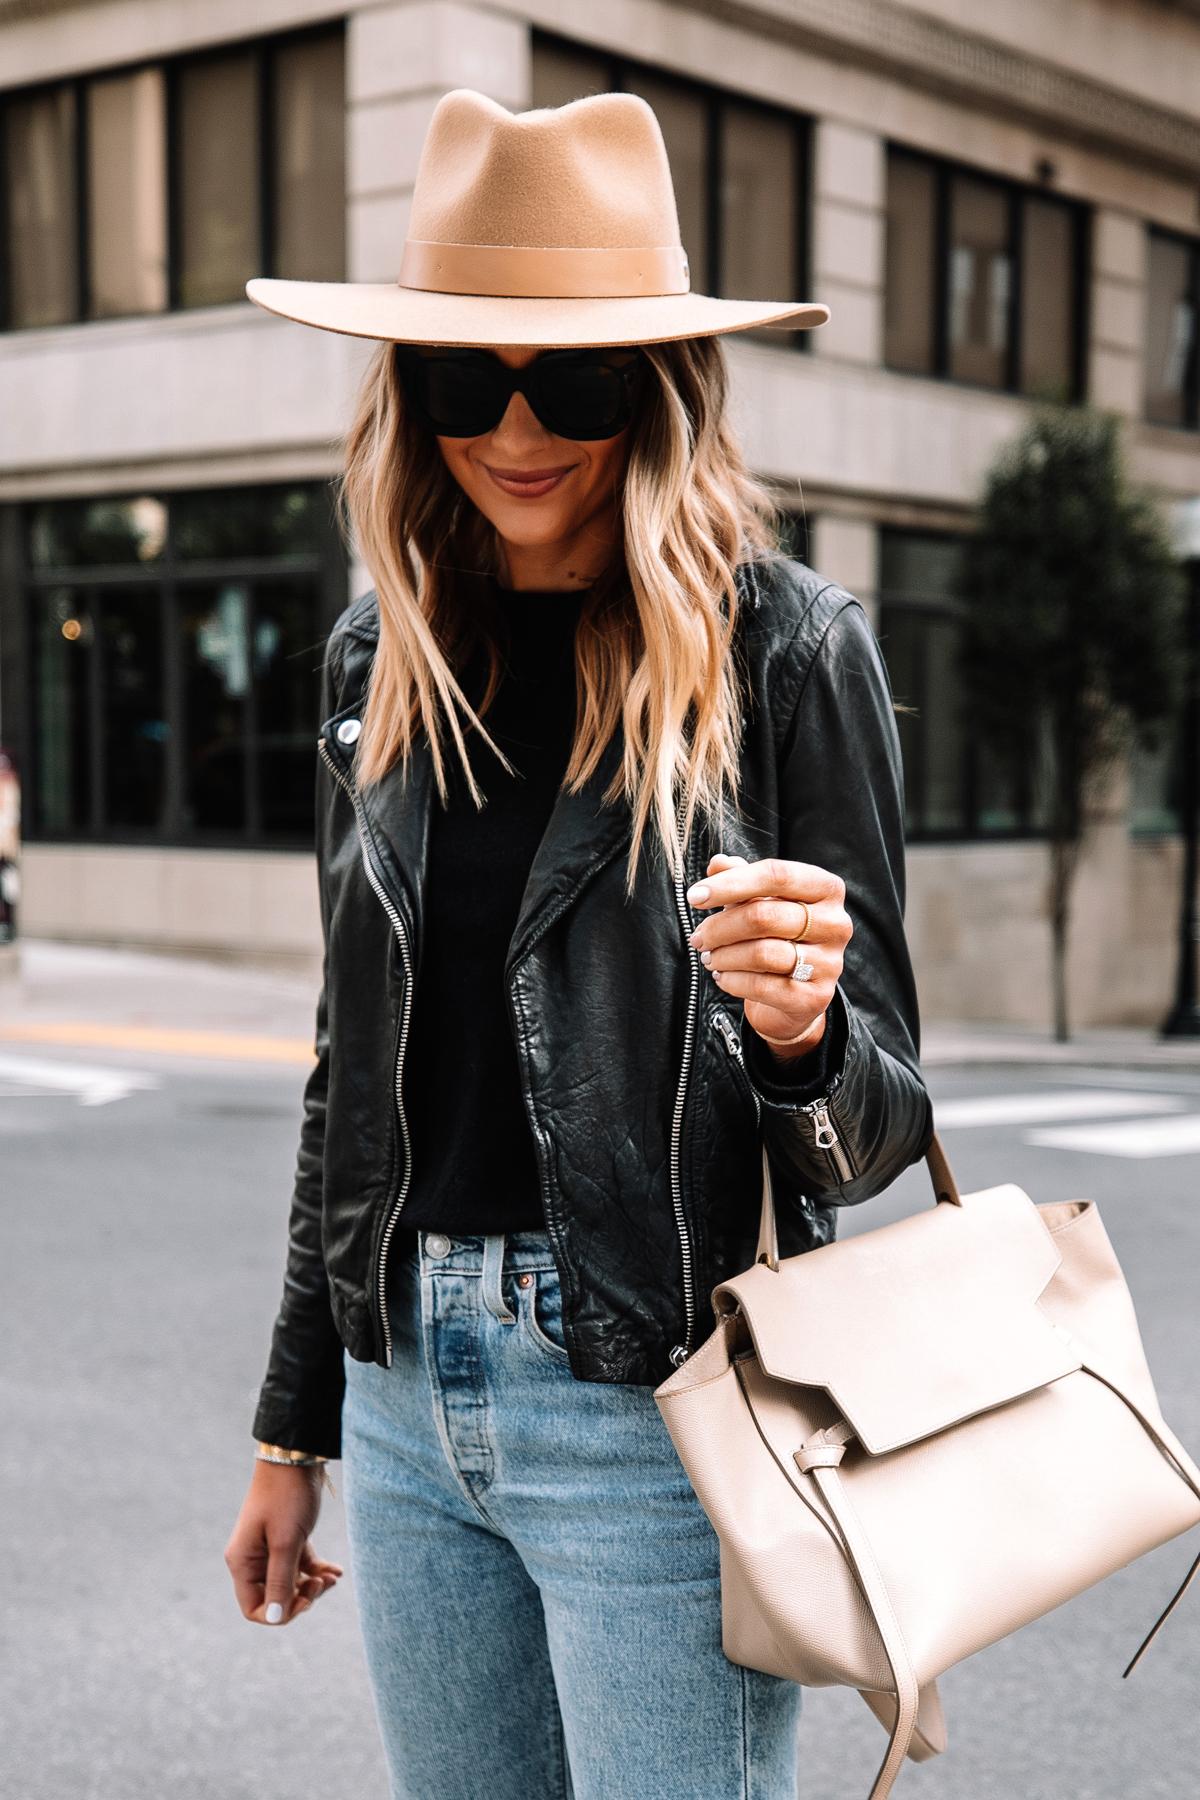 Fashion Jackson Wearing Madewell Black Leather Jacket Black Sweater Levis Jeans Rag and Bone Fall Hat Celine Belt Bag